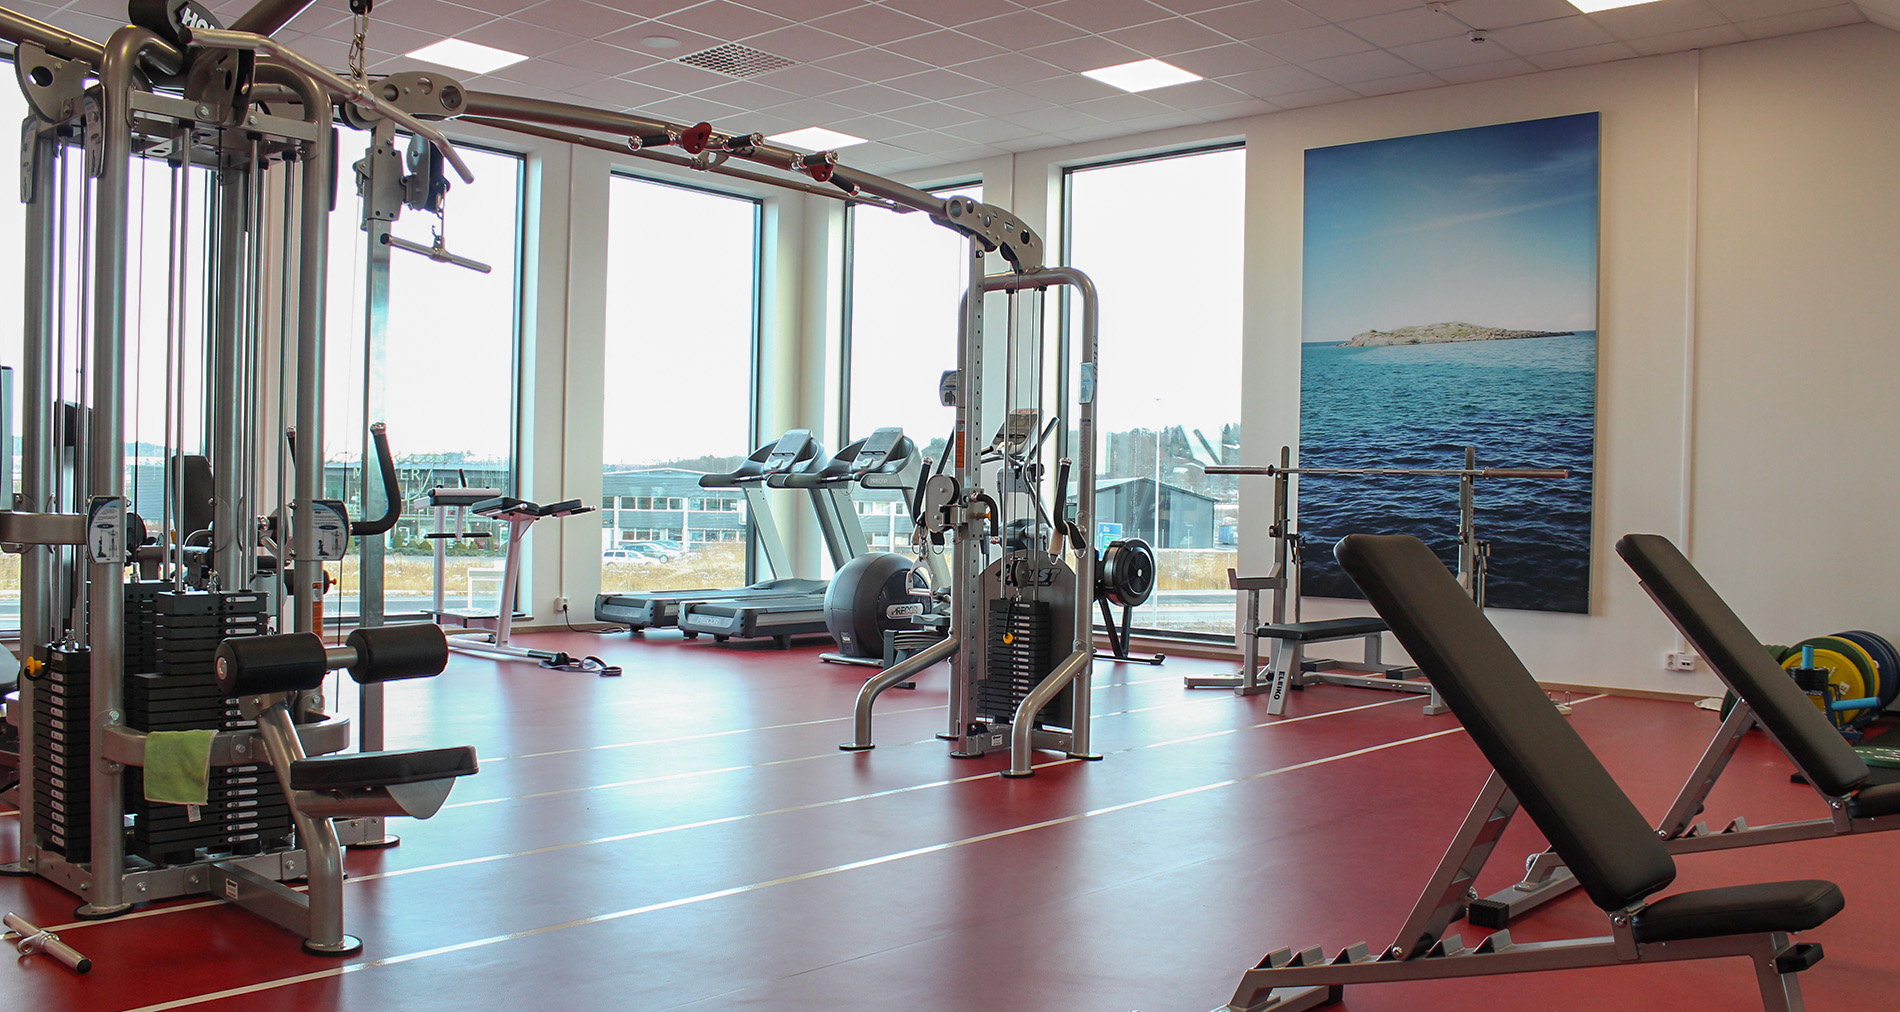 Gym Utrustning